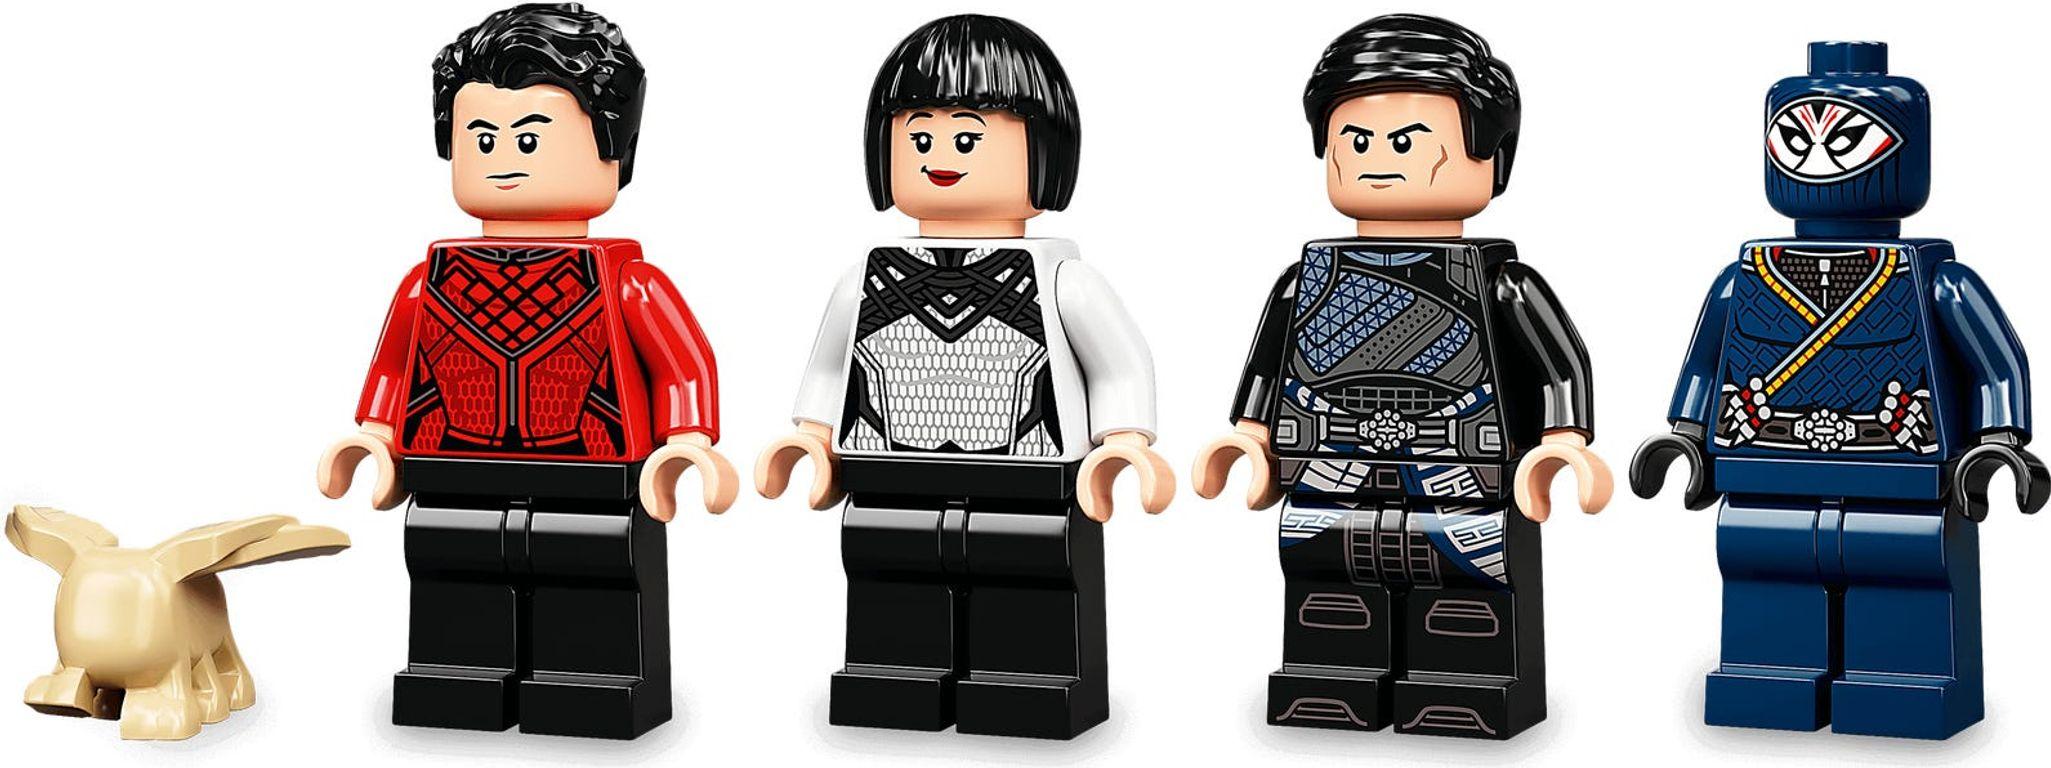 LEGO® Marvel Battle at the Ancient Village minifigures